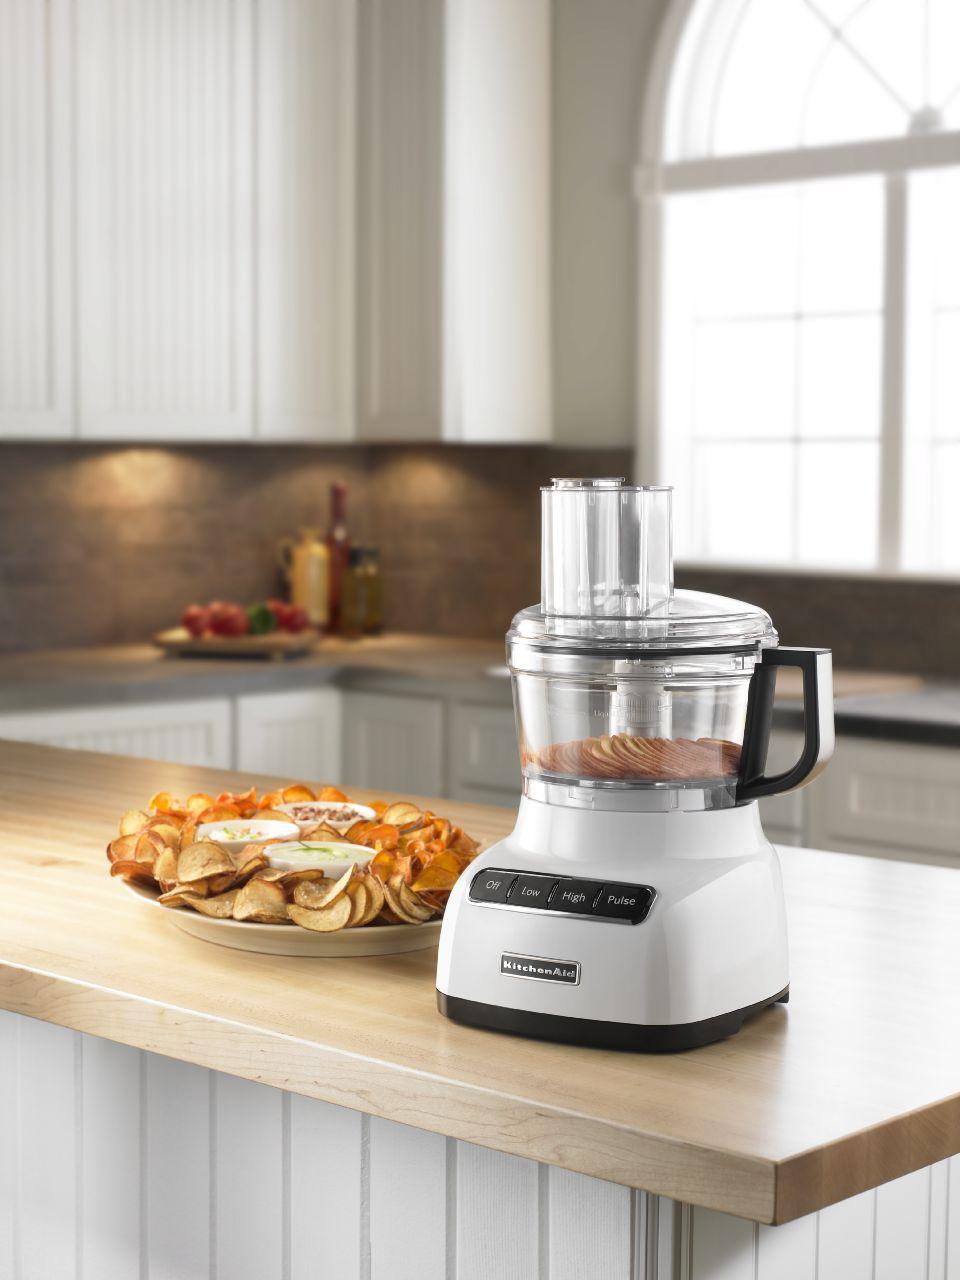 KitchenAid-7-Cup-Food-Processor thumbnail 16